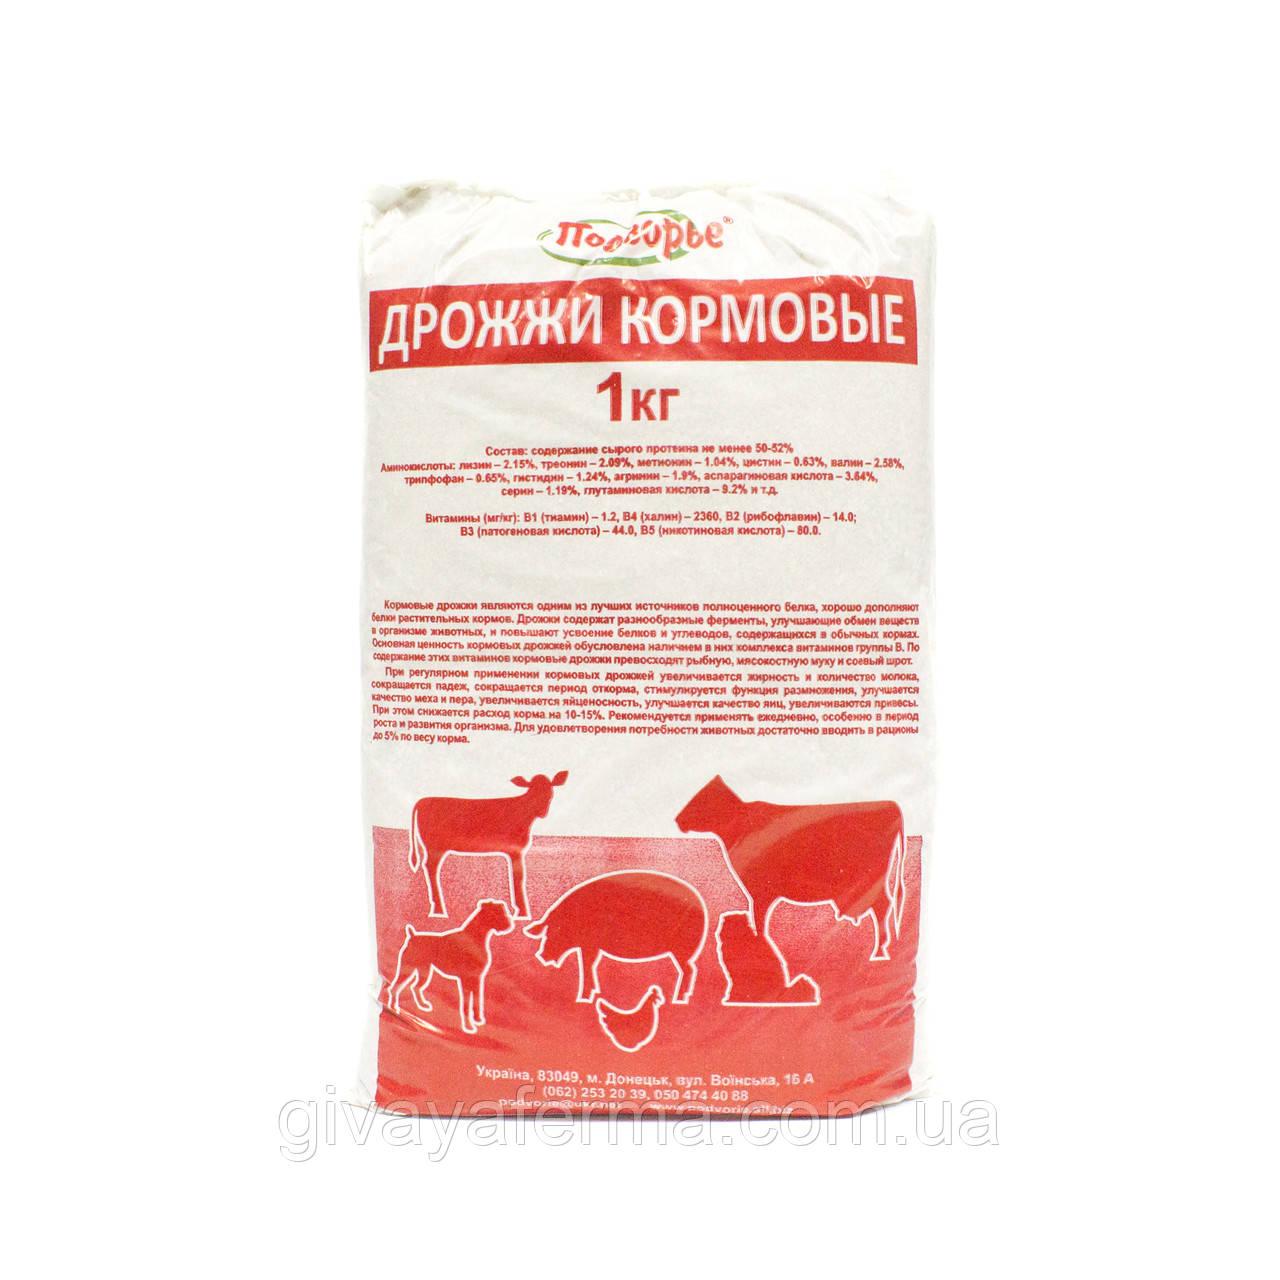 Дрожжи кормовые Протеин 39%, 32 кг, белково-витаминная добавка (для животных и птиц)